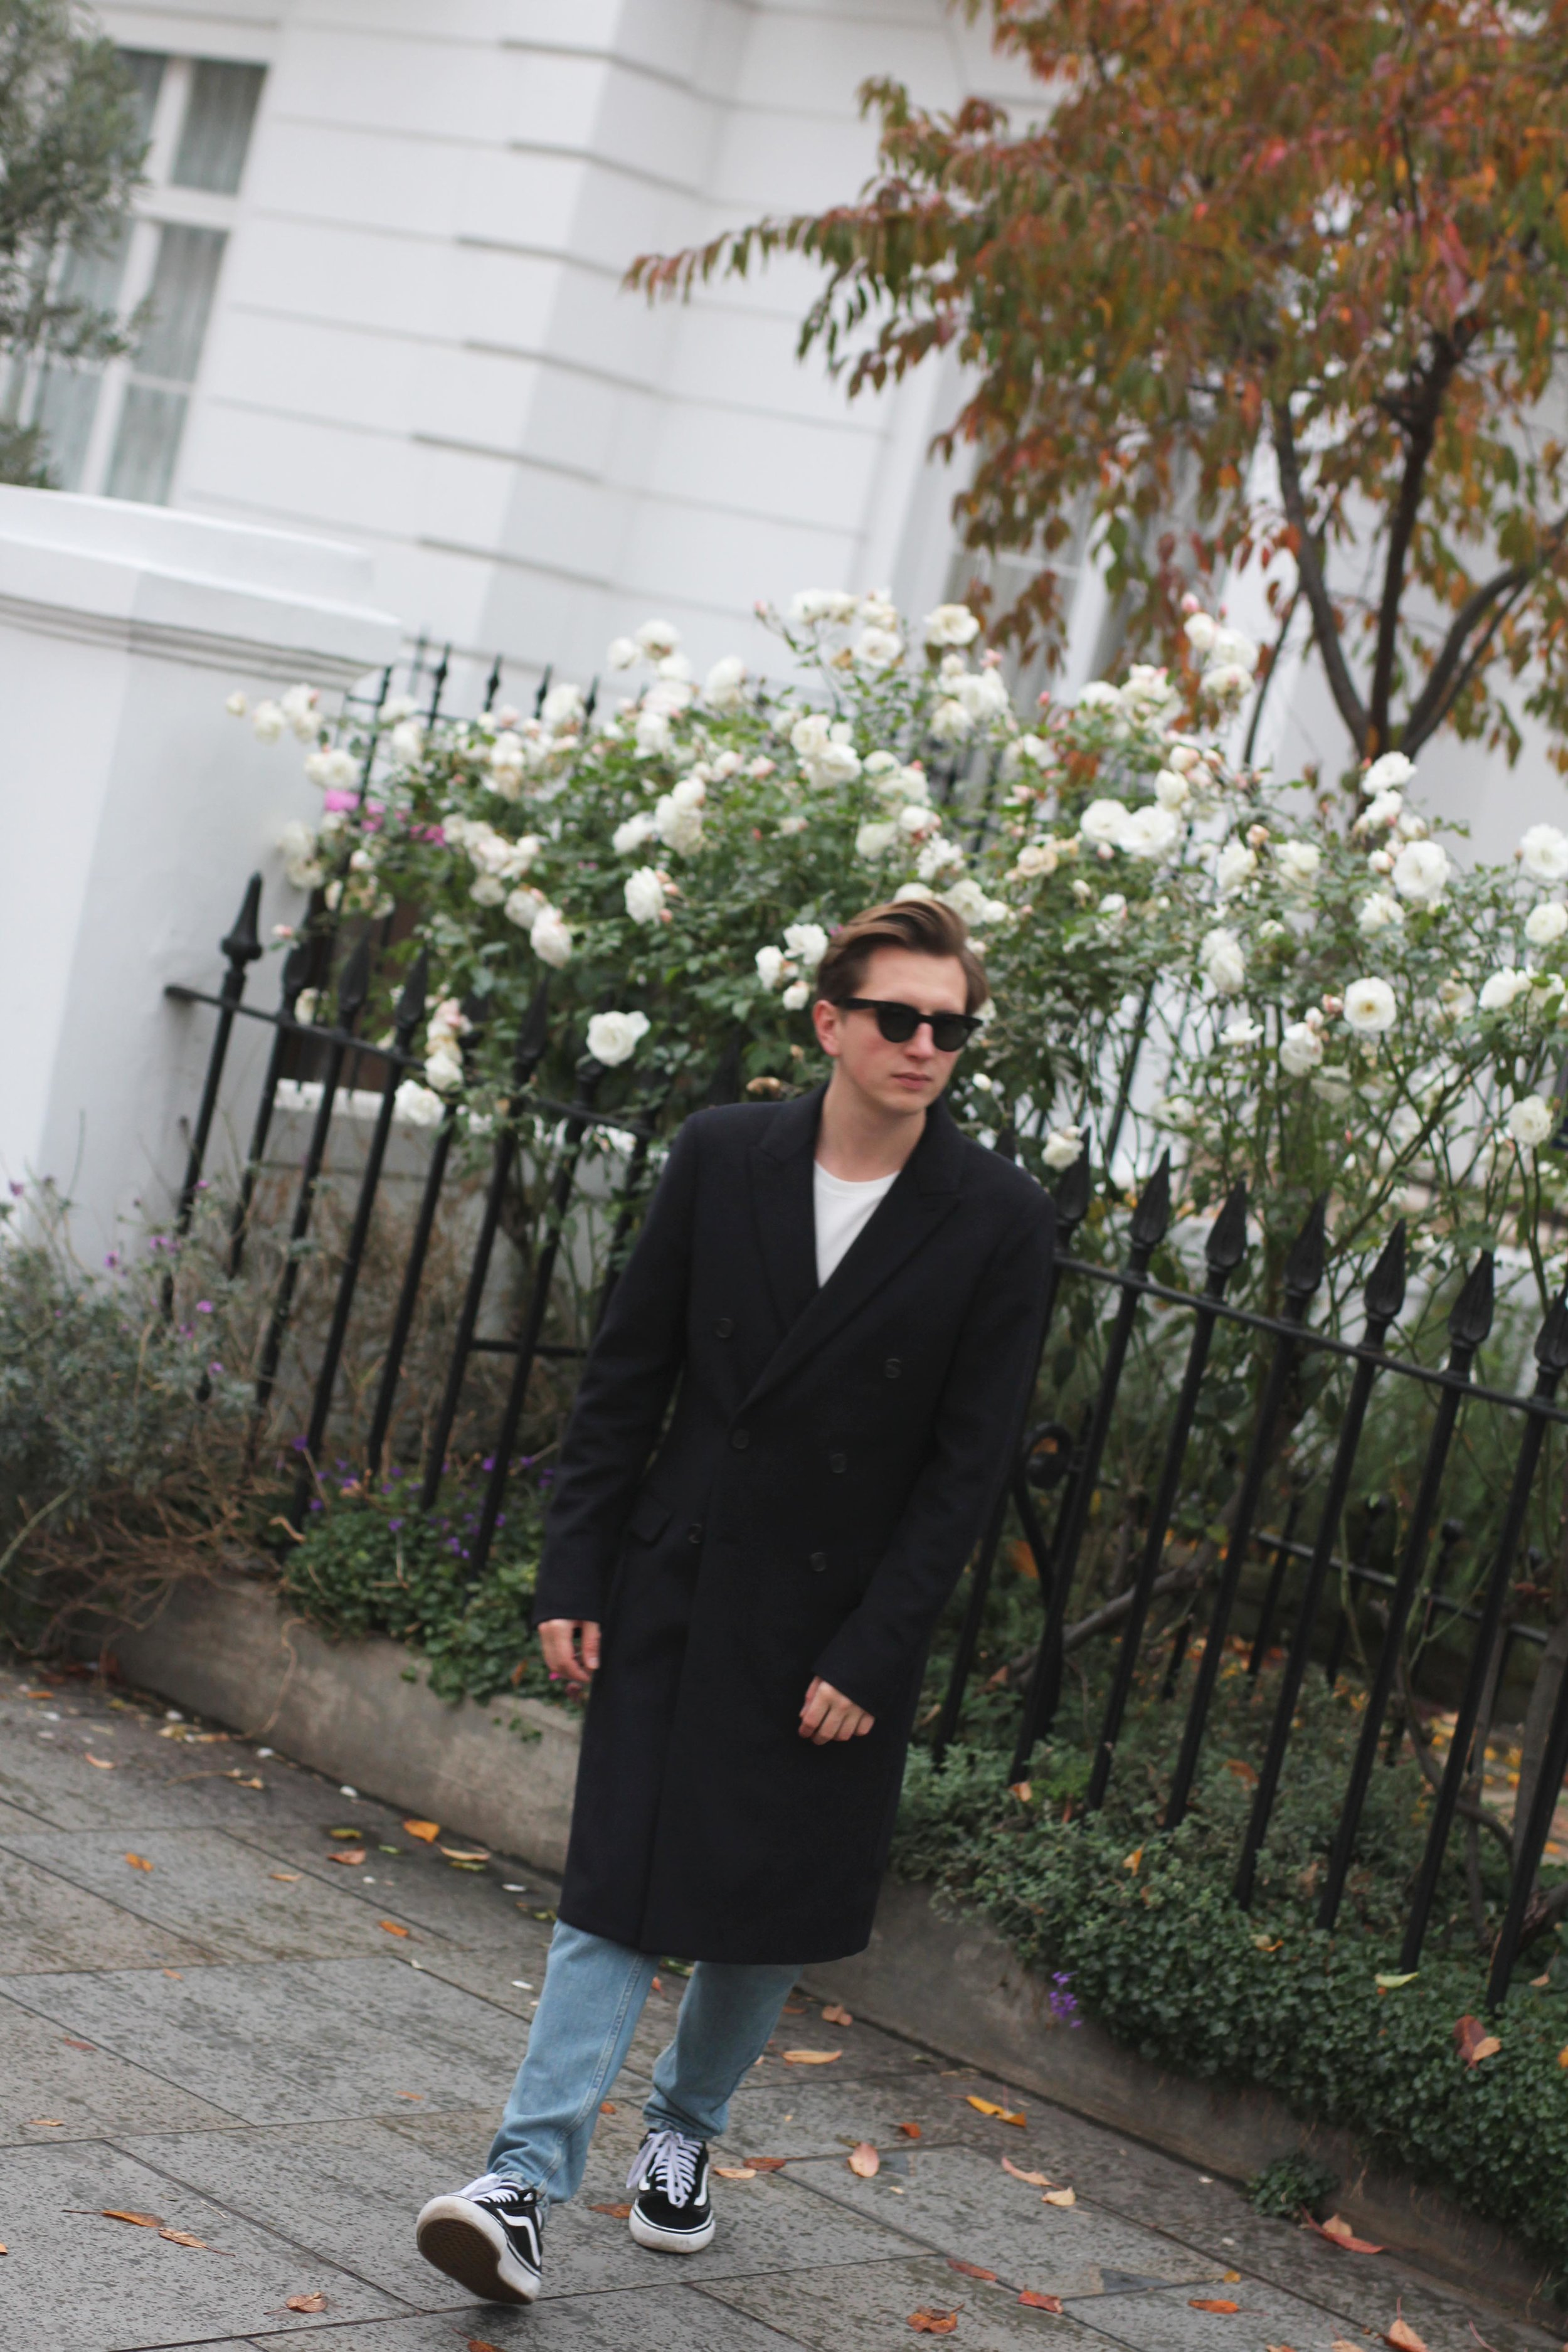 belgravia_ootd_menswear_mensfashion_london_rolandas_lusinskis